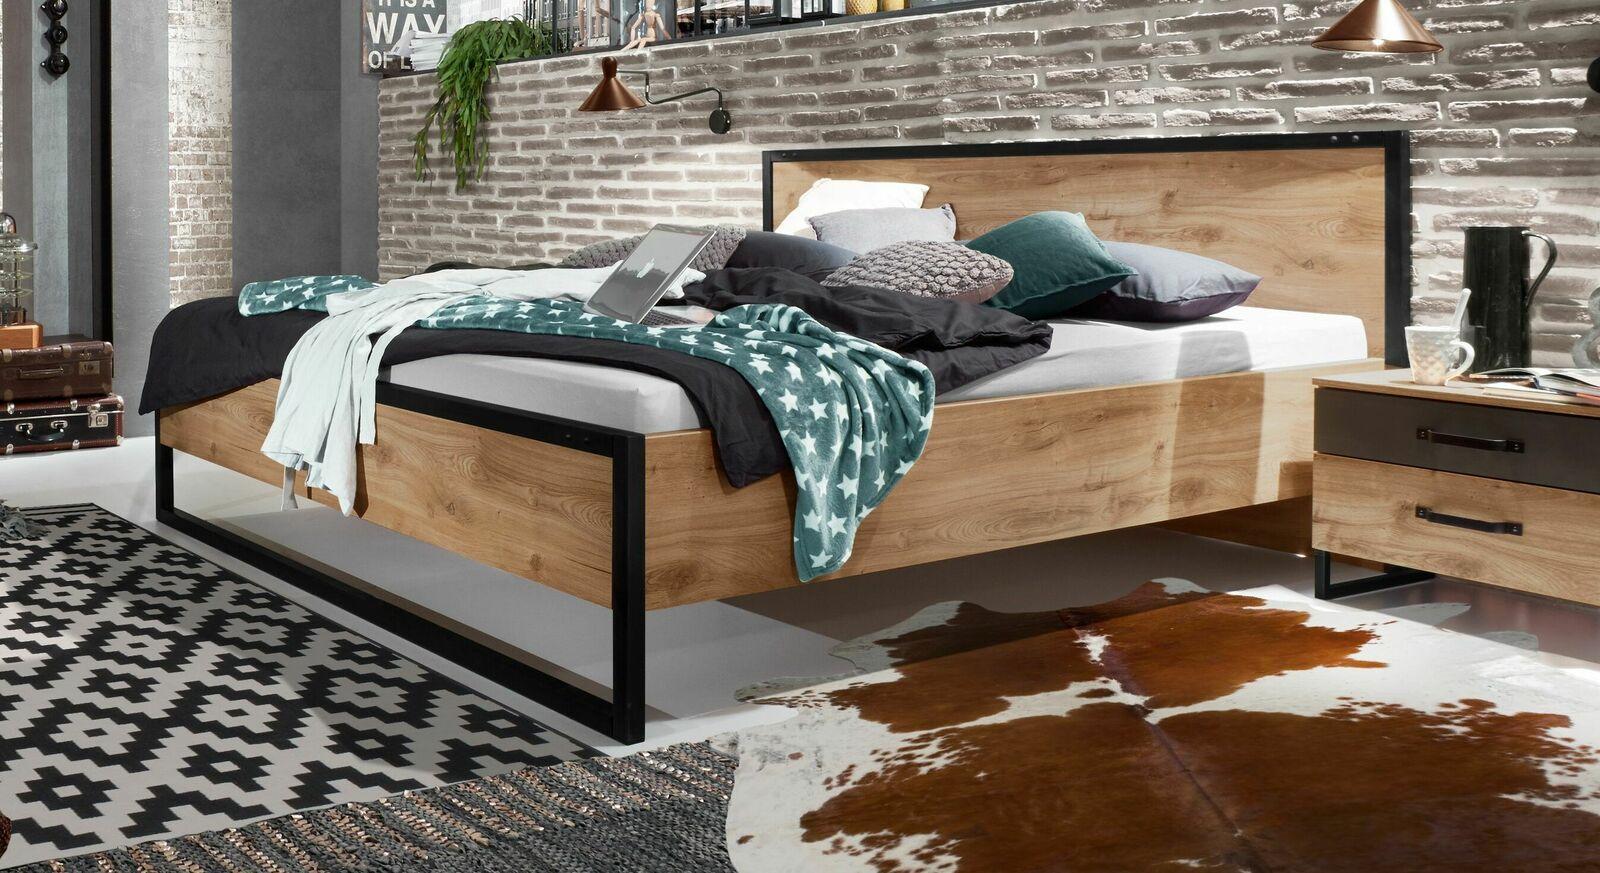 designerbett g nstig im industrial style mit metall lakewood. Black Bedroom Furniture Sets. Home Design Ideas